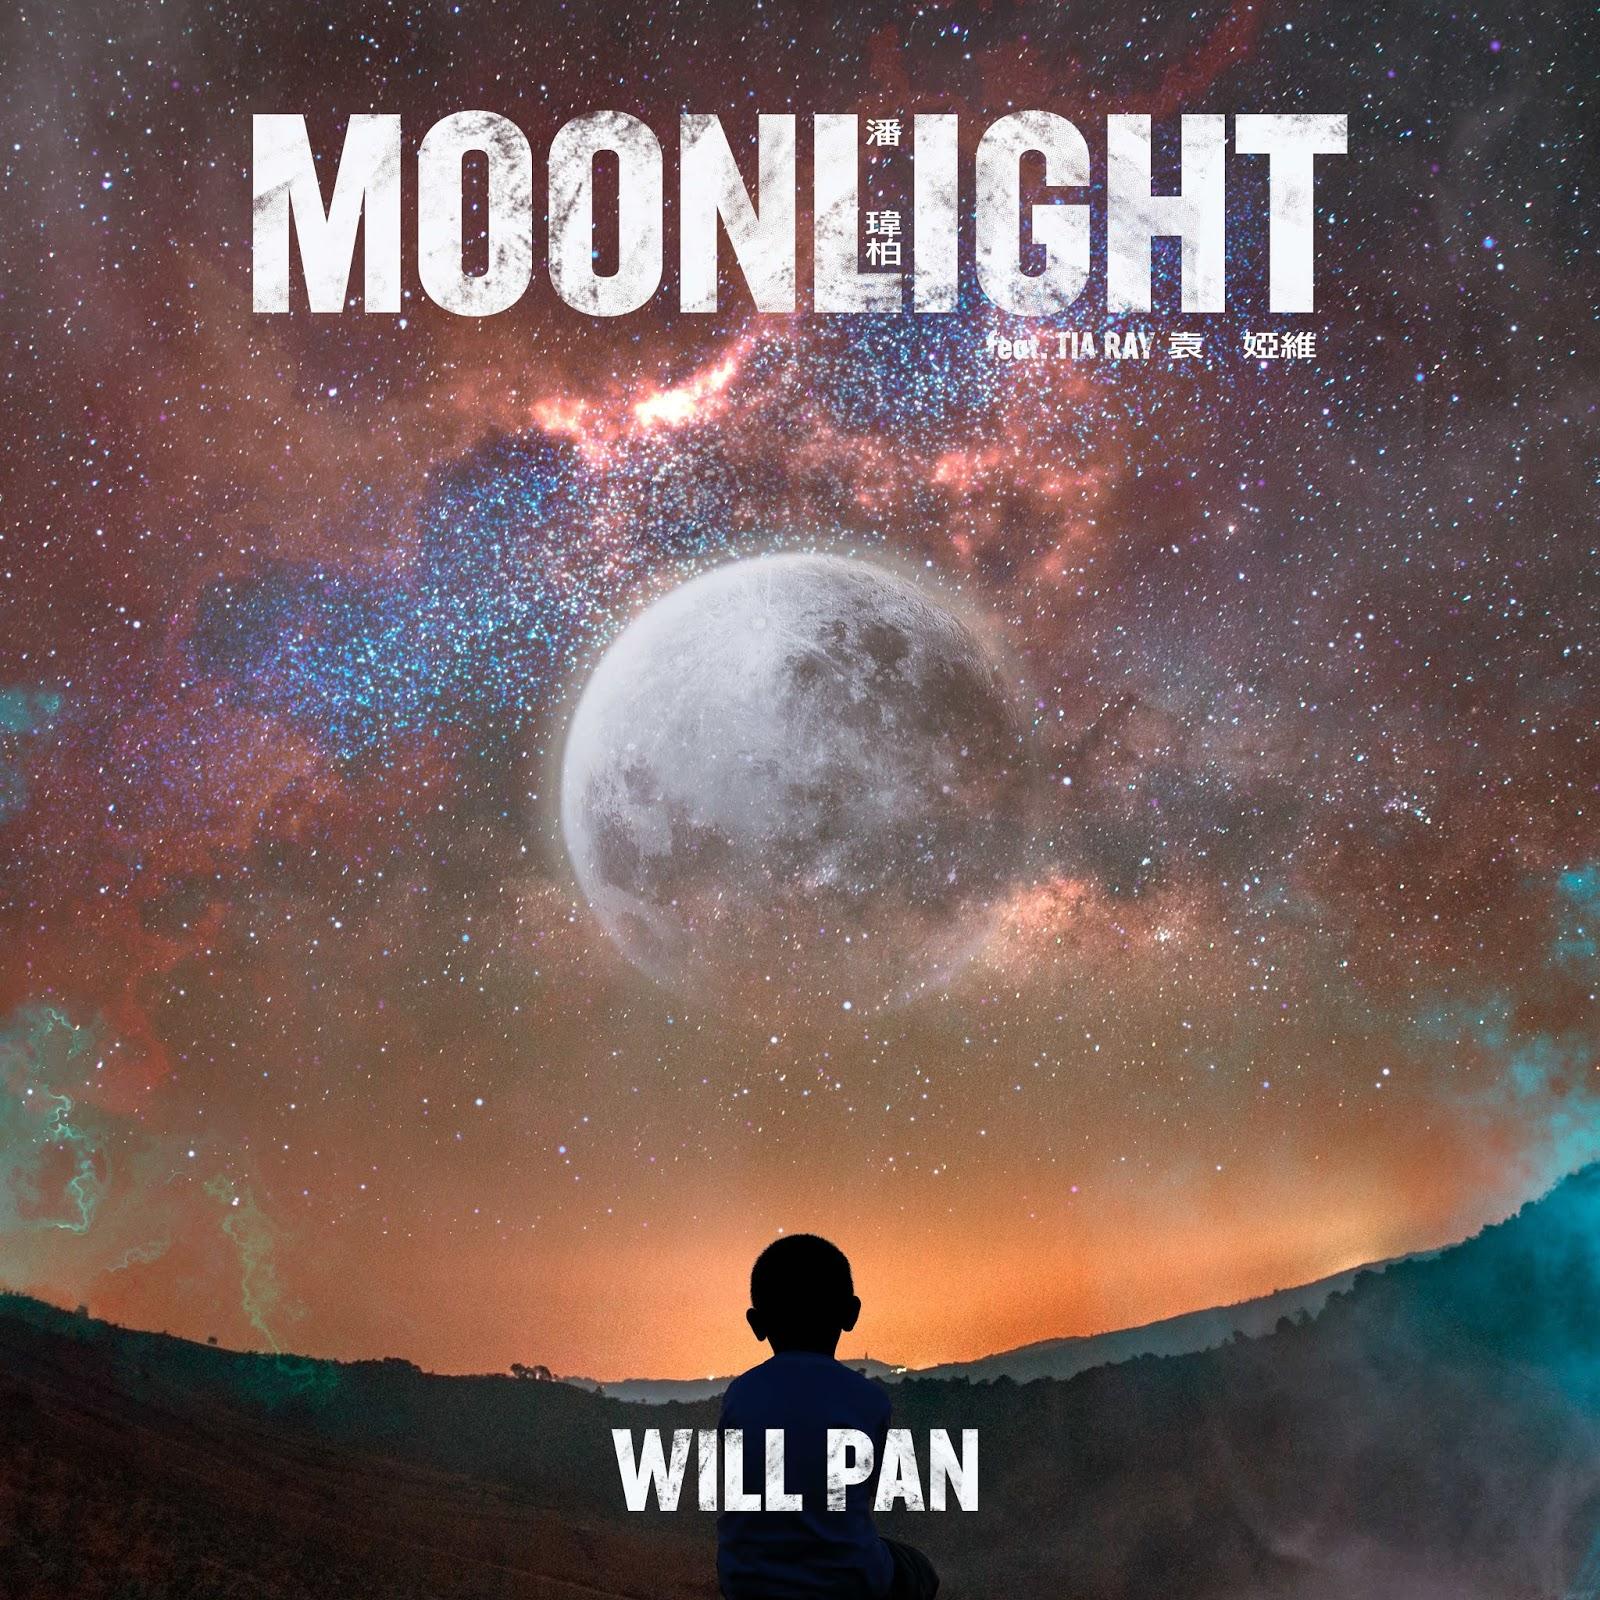 Will Pan 潘瑋柏 - Moonlight 中文版 (Chinese Version) 歌詞 Lyrics with Pinyin - Musicacrossasia